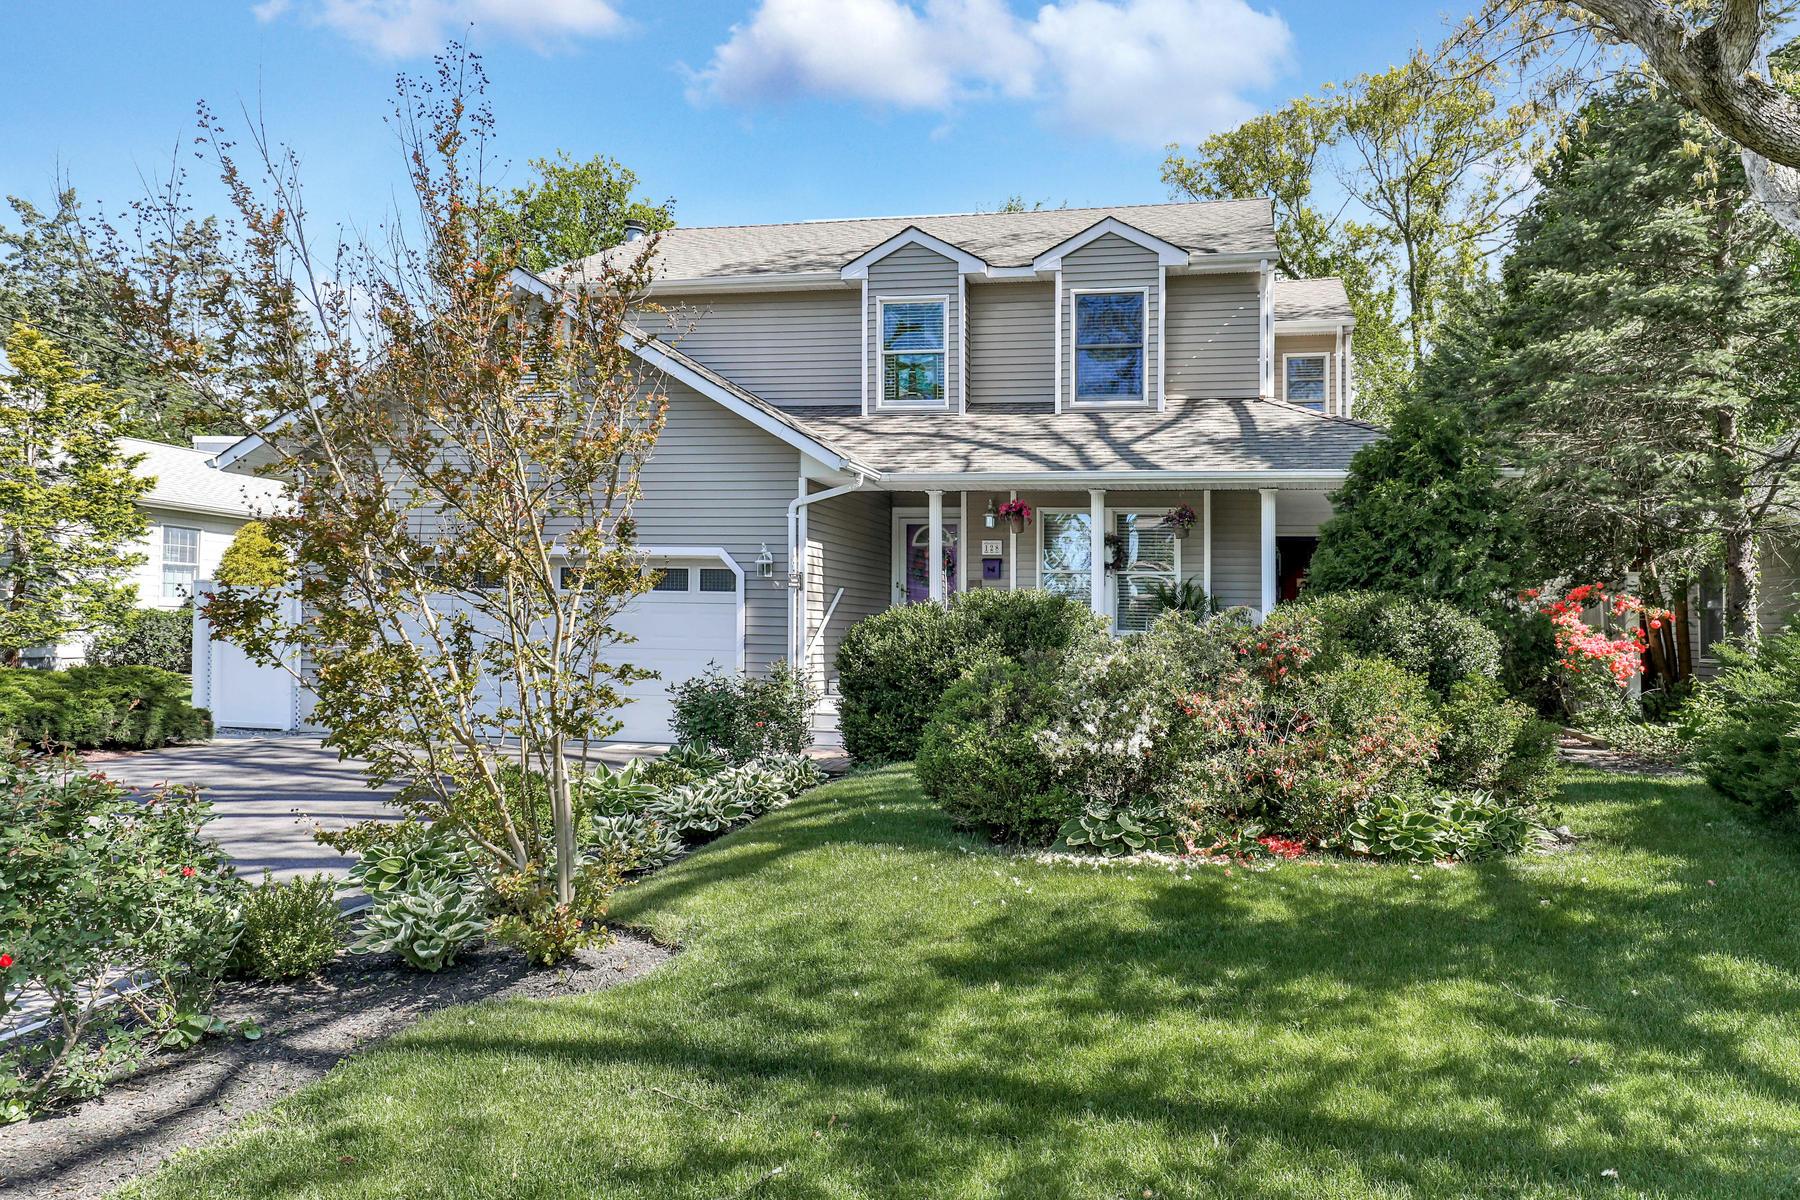 独户住宅 为 销售 在 Located In The Wonderful Cranmoor Section 128 Cranmoor Drive 汤姆斯河, 新泽西州 08753 美国